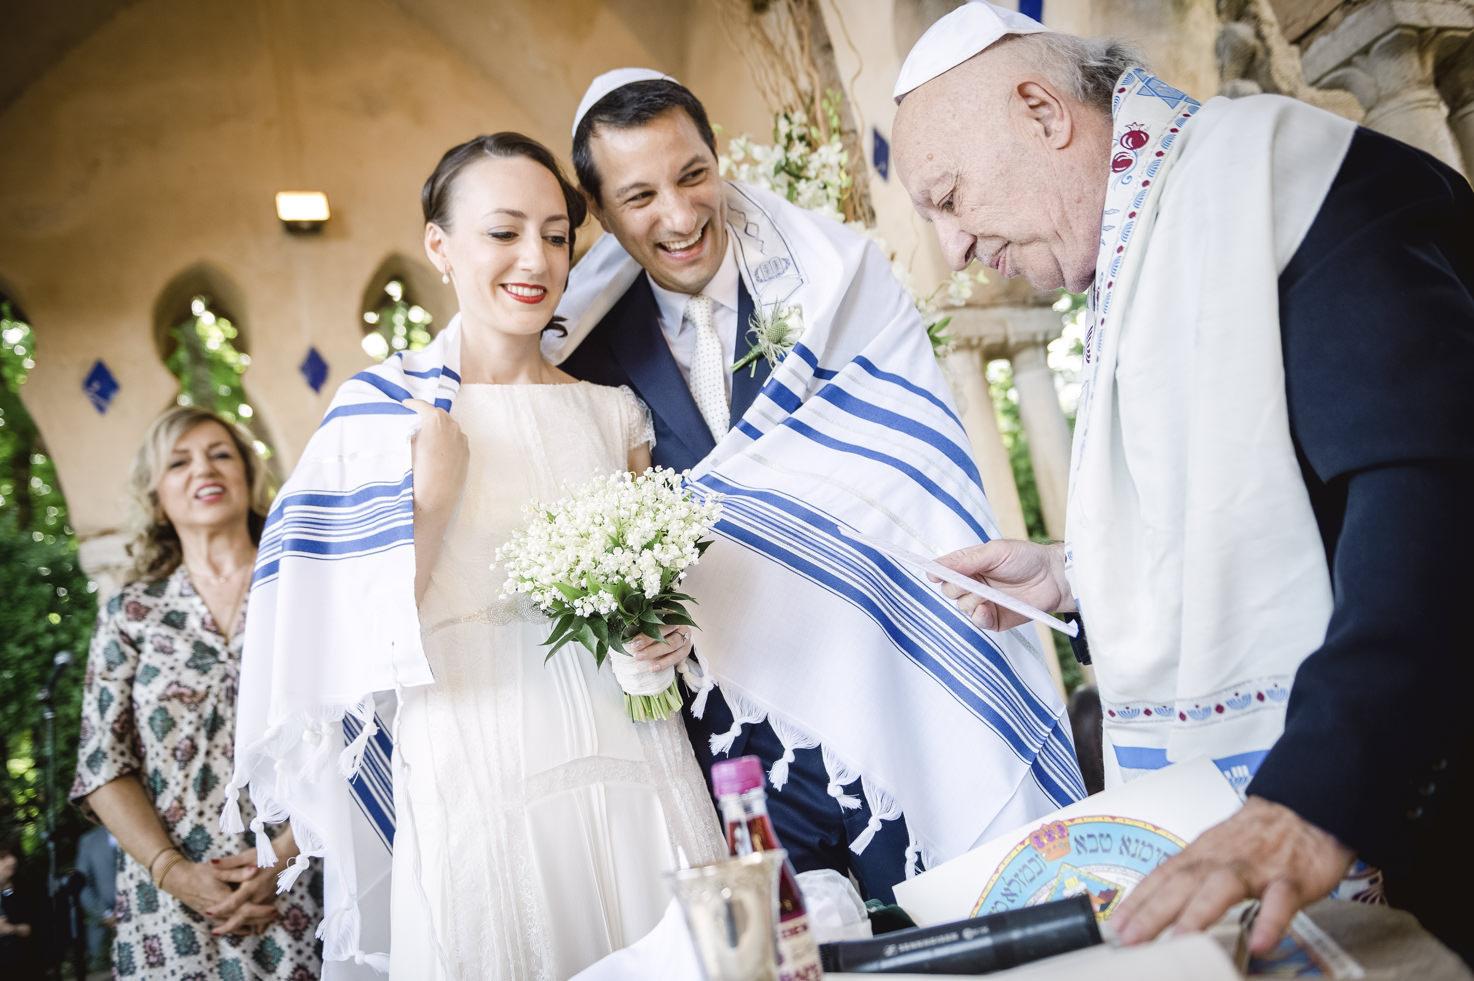 Jewish wedding ceremony at Villa Cimbrone, Ravello